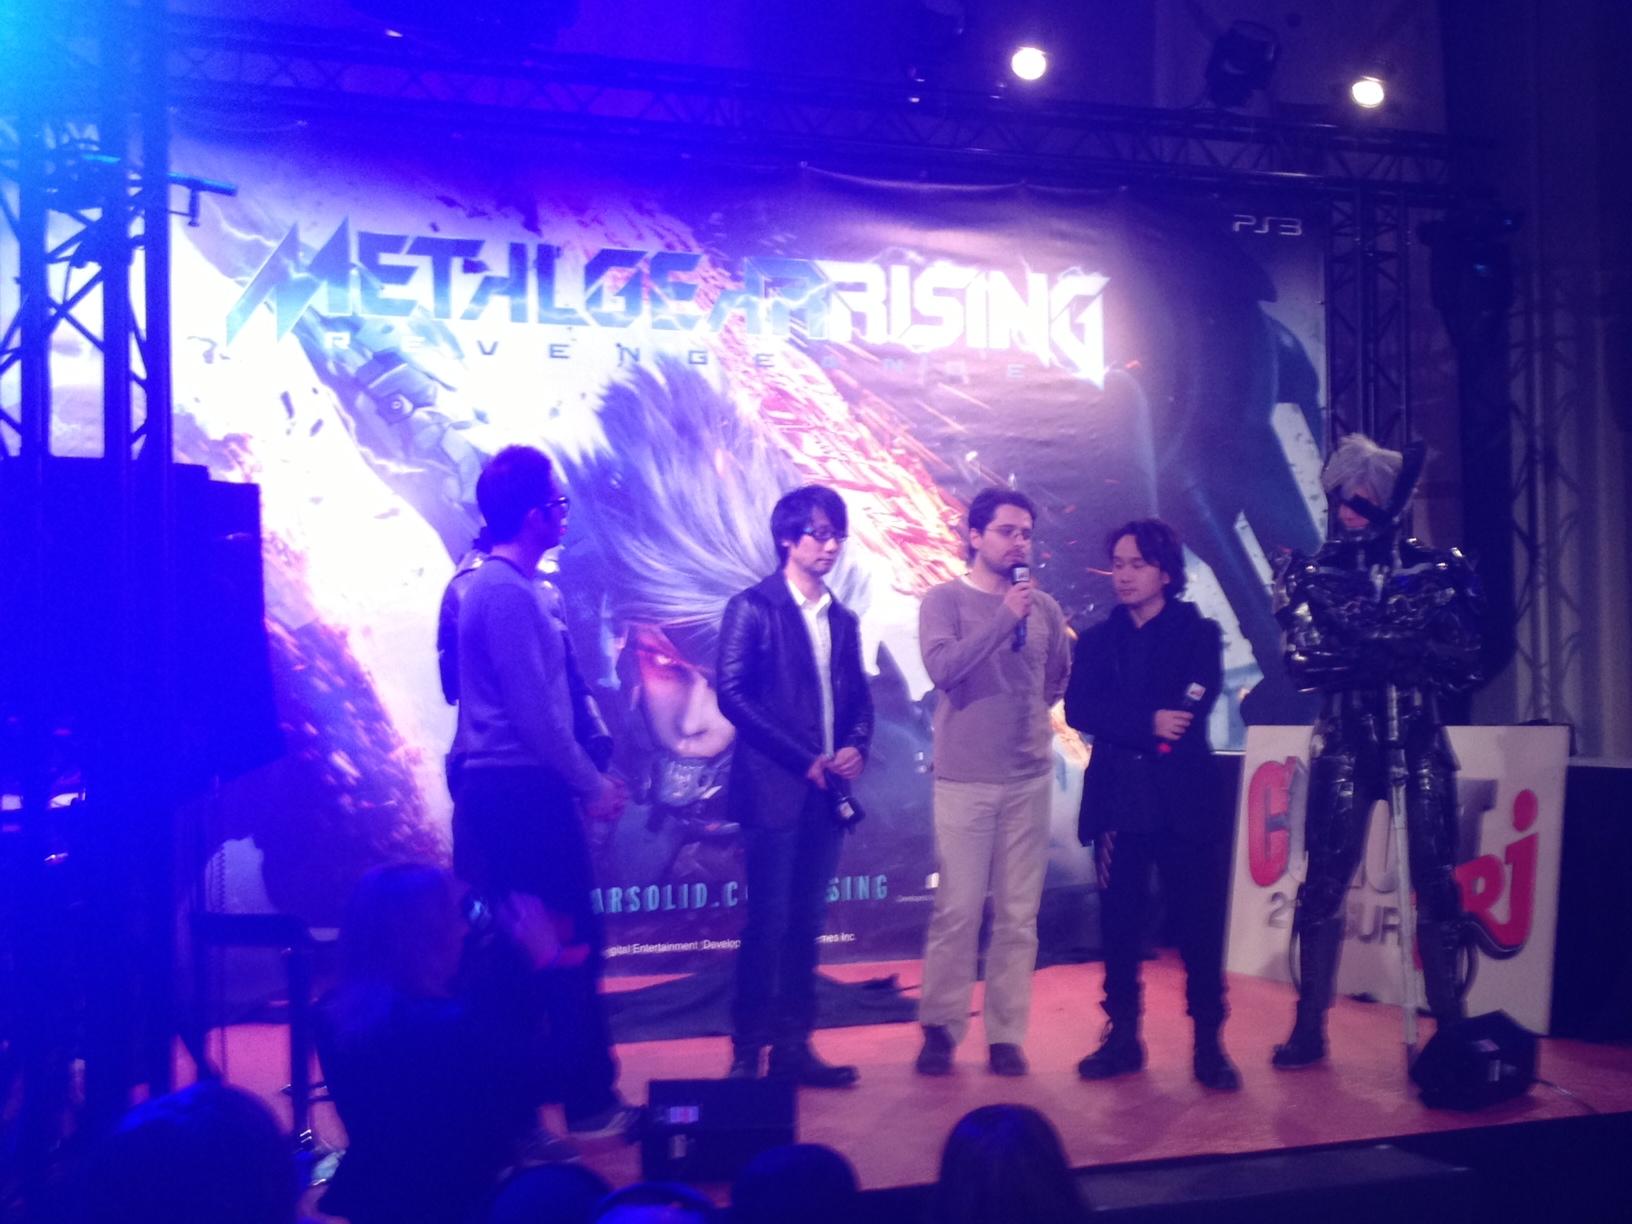 [COMPTE-RENDU] Soiree de lancement Metal Gear Rising